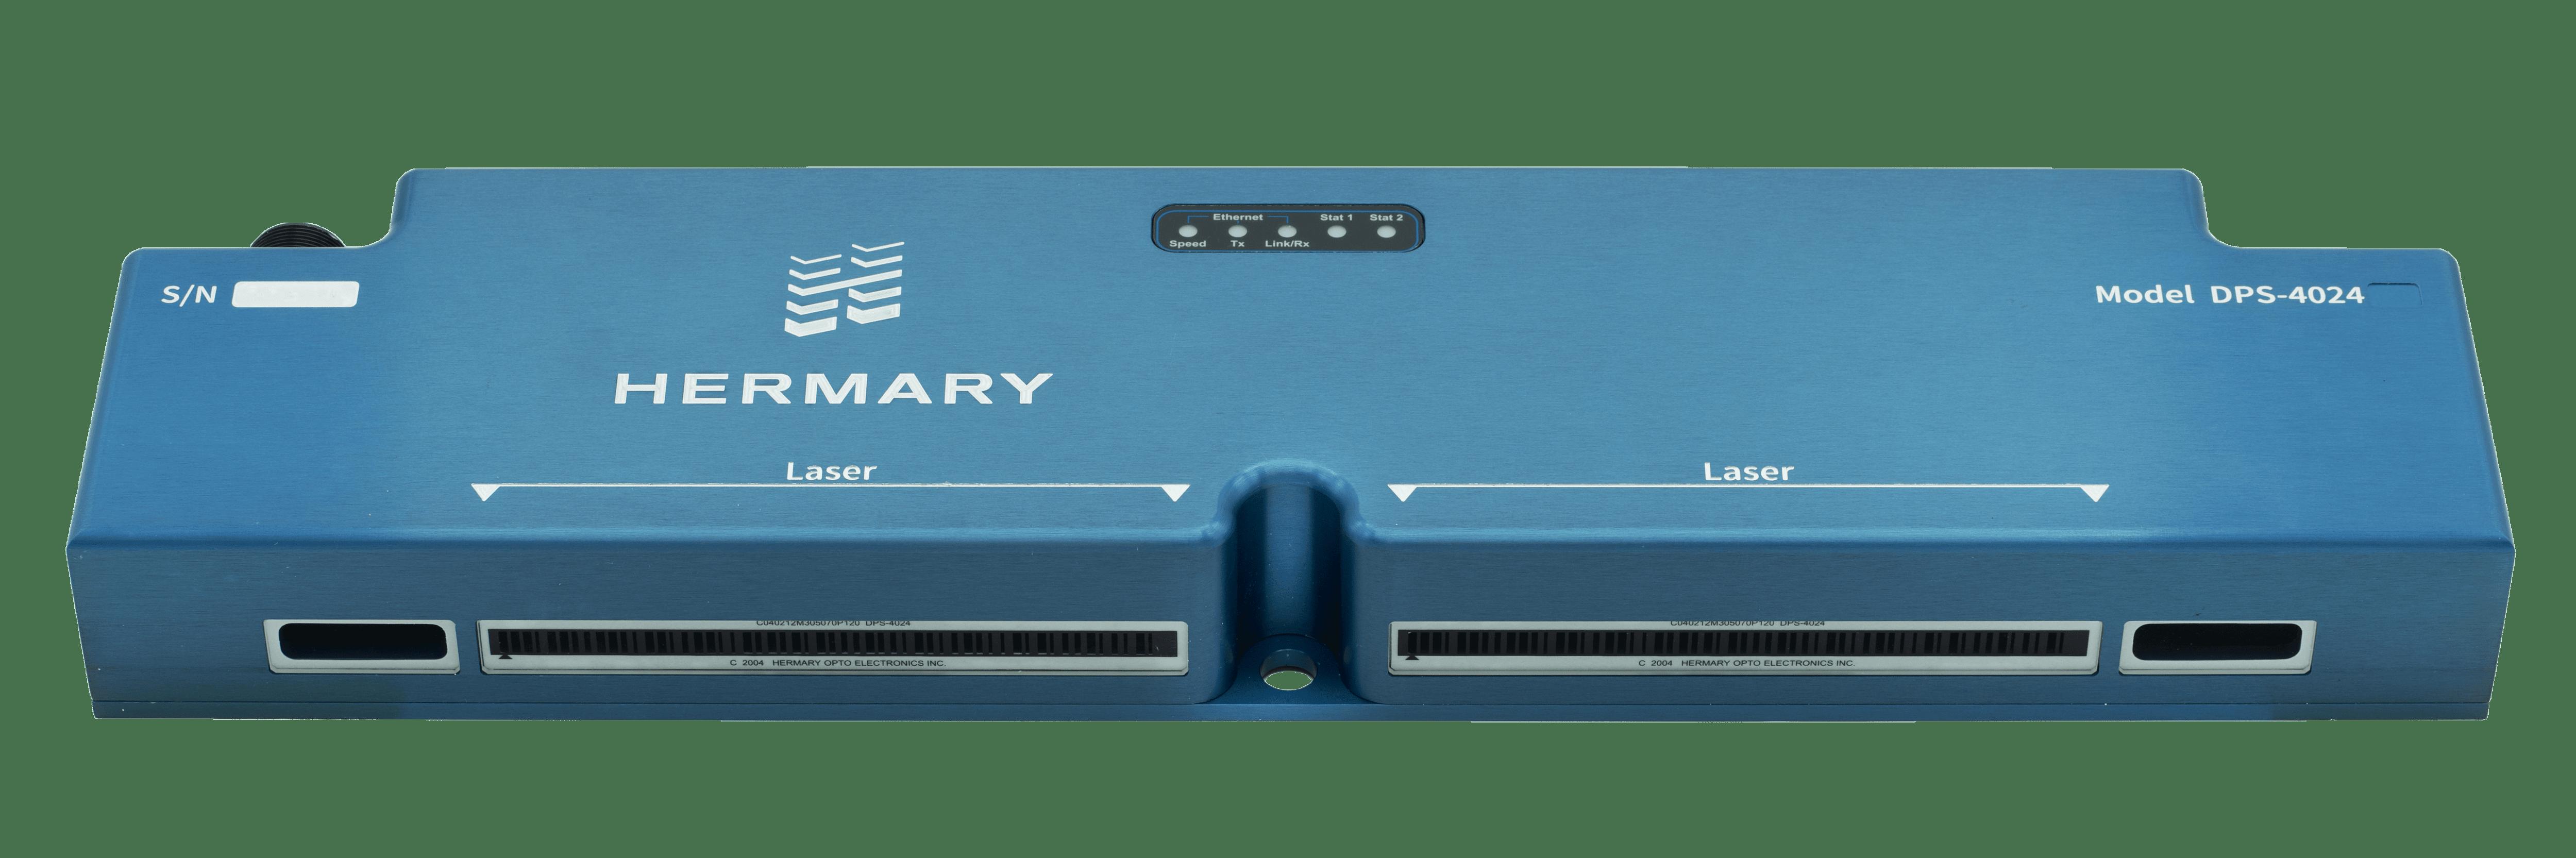 DPS-4024 ultra high ambien coplanar 3D scanner